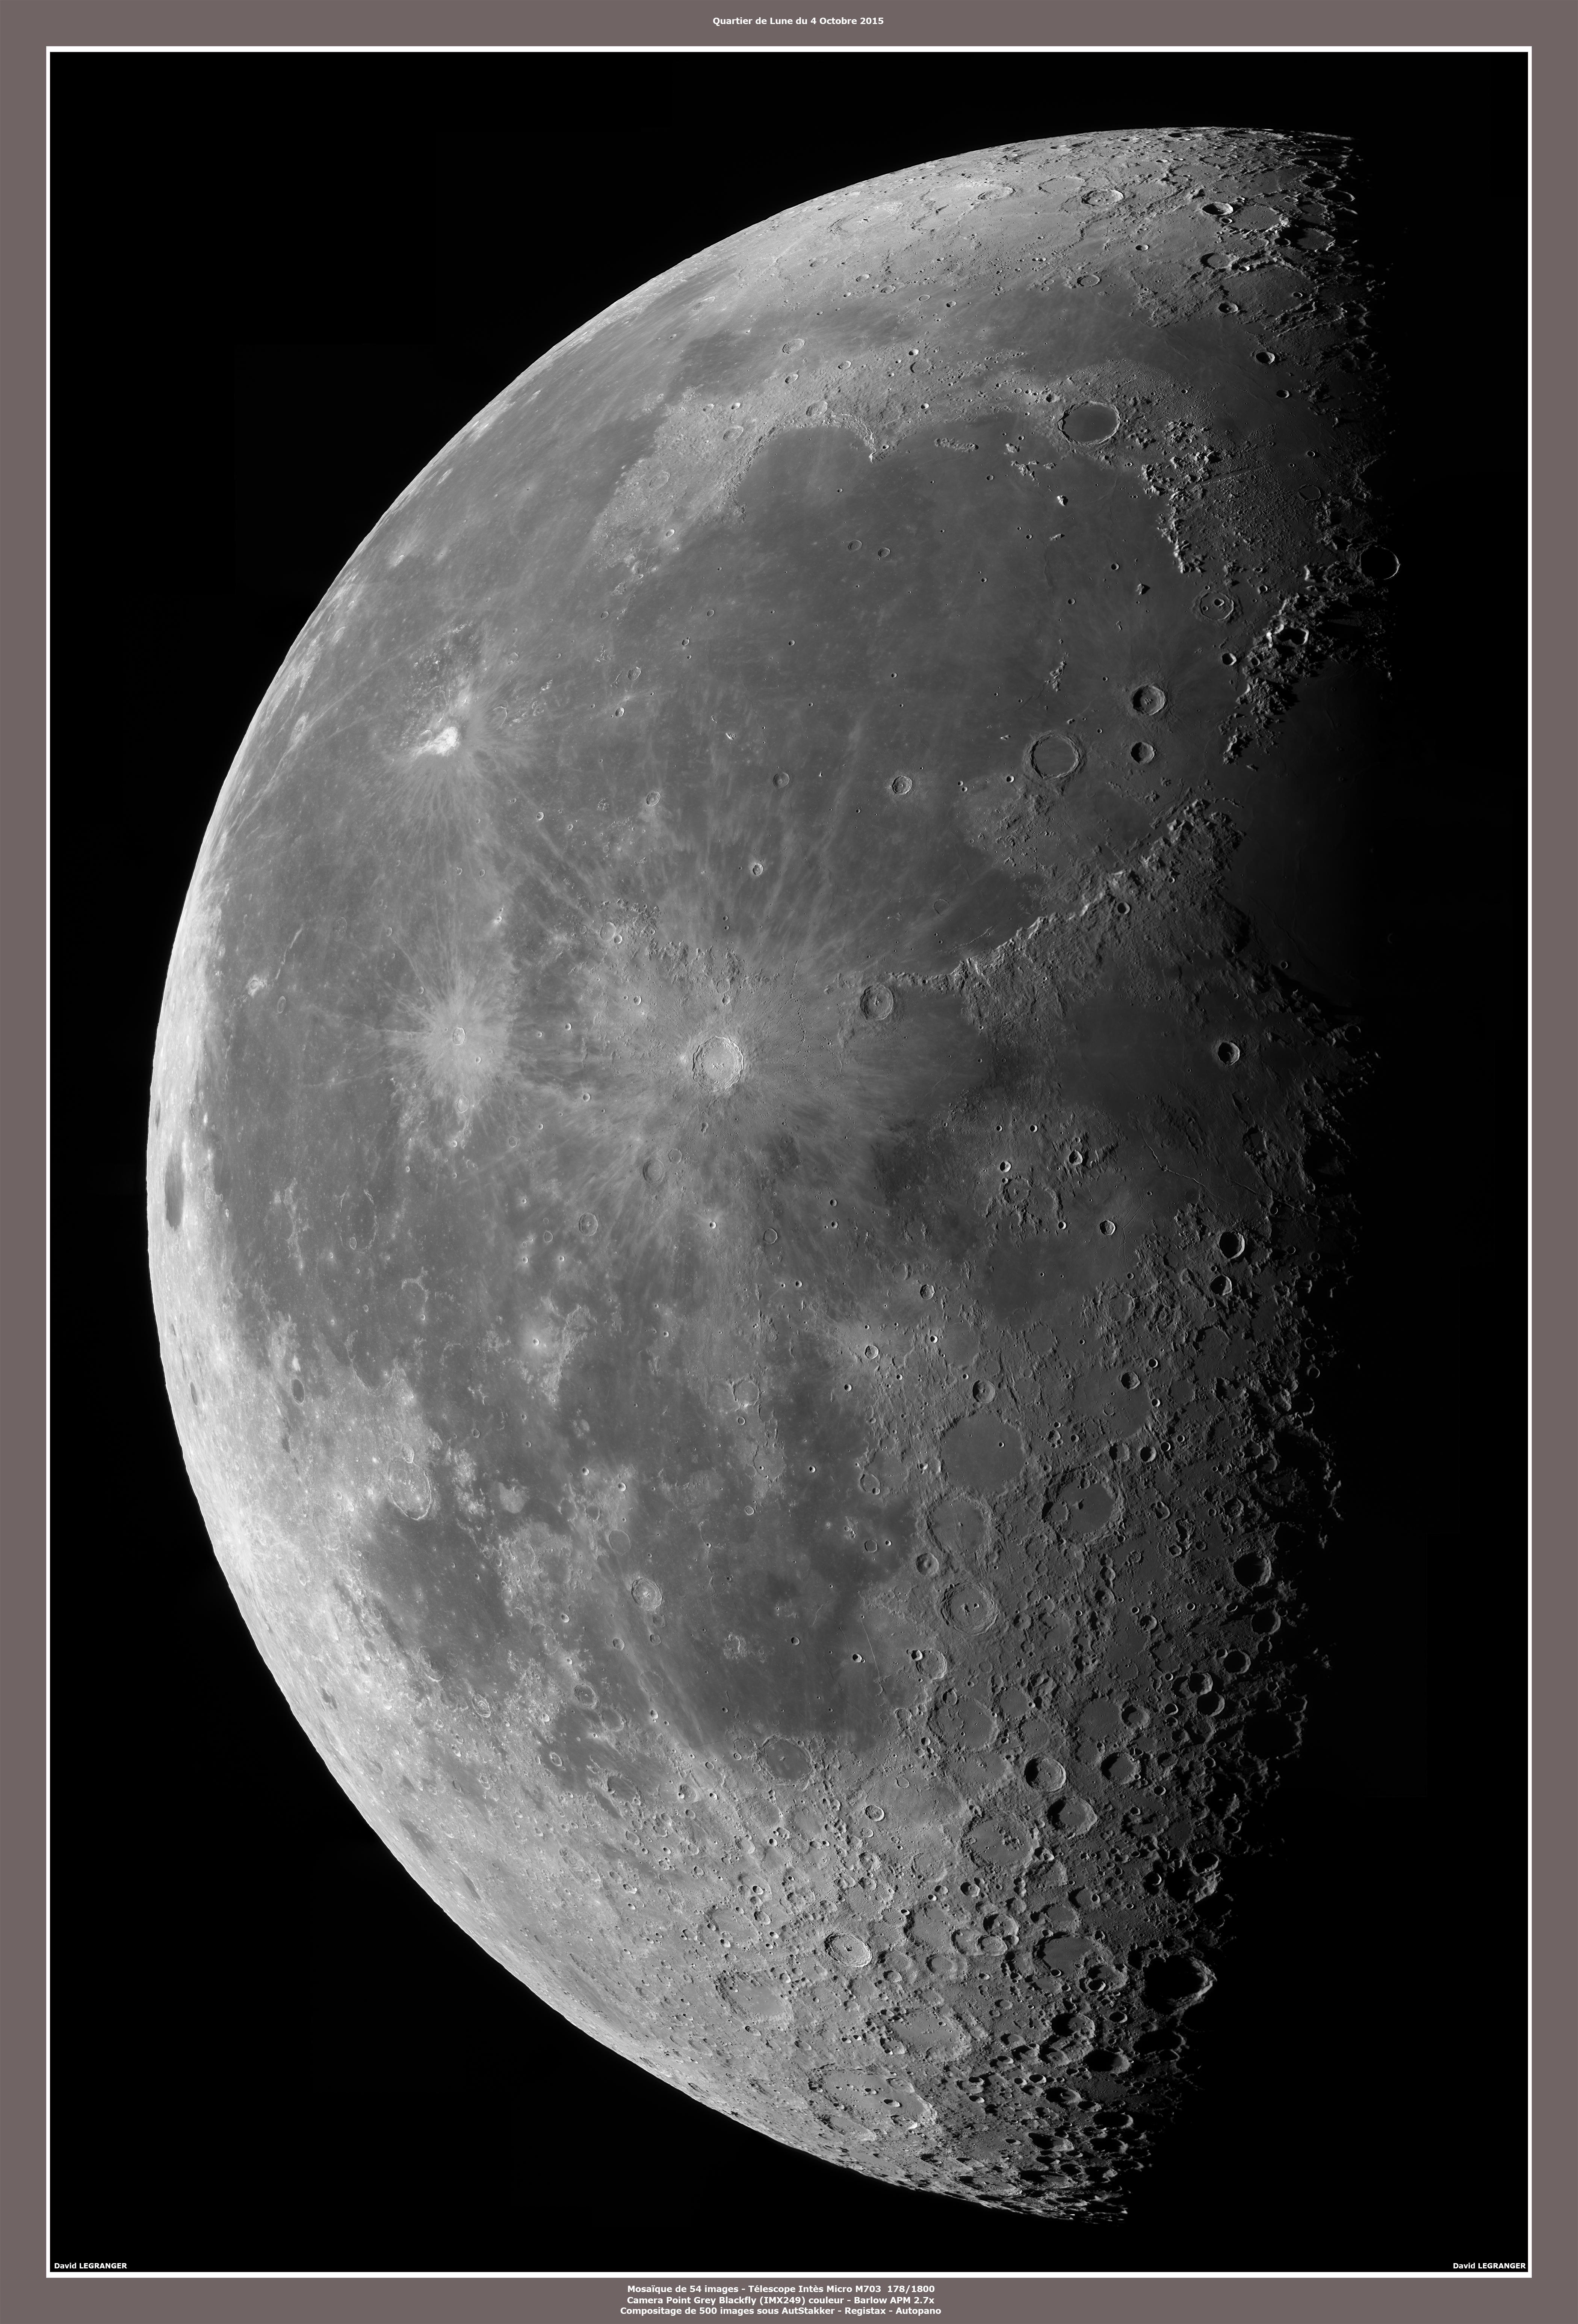 2015-10-04_moon_mak180_imx249@d.legrange